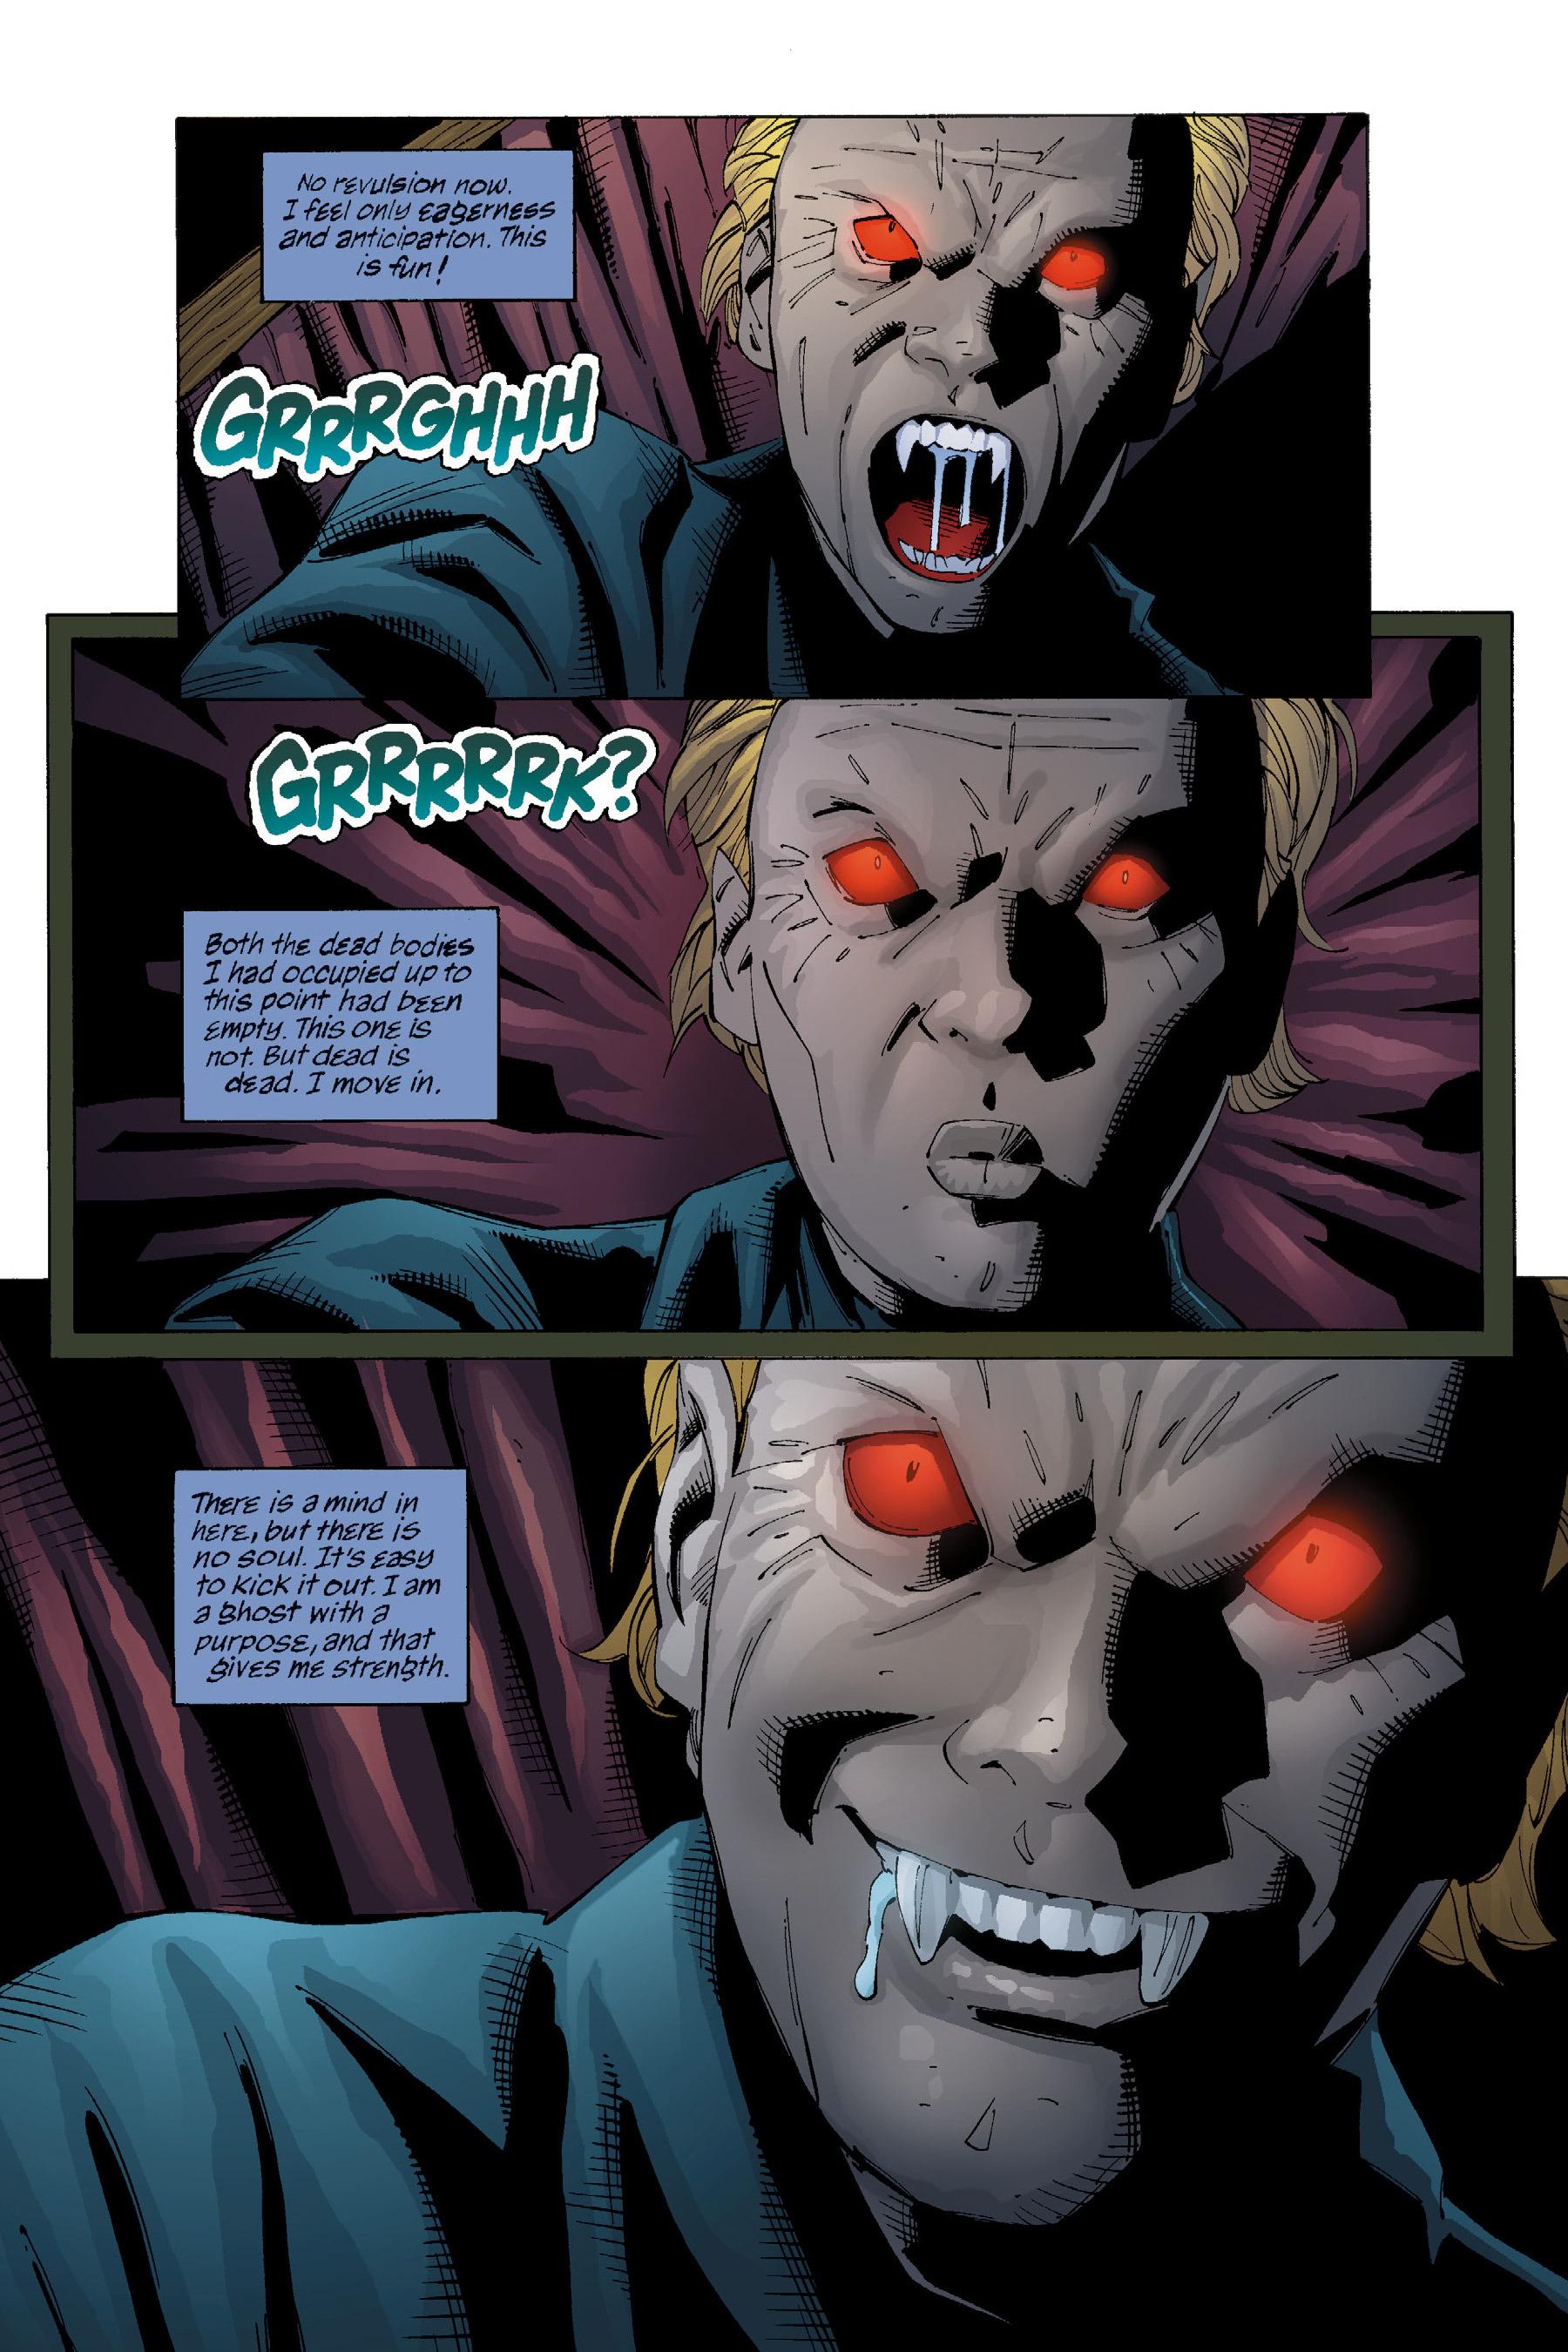 Read online Buffy the Vampire Slayer: Omnibus comic -  Issue # TPB 5 - 29